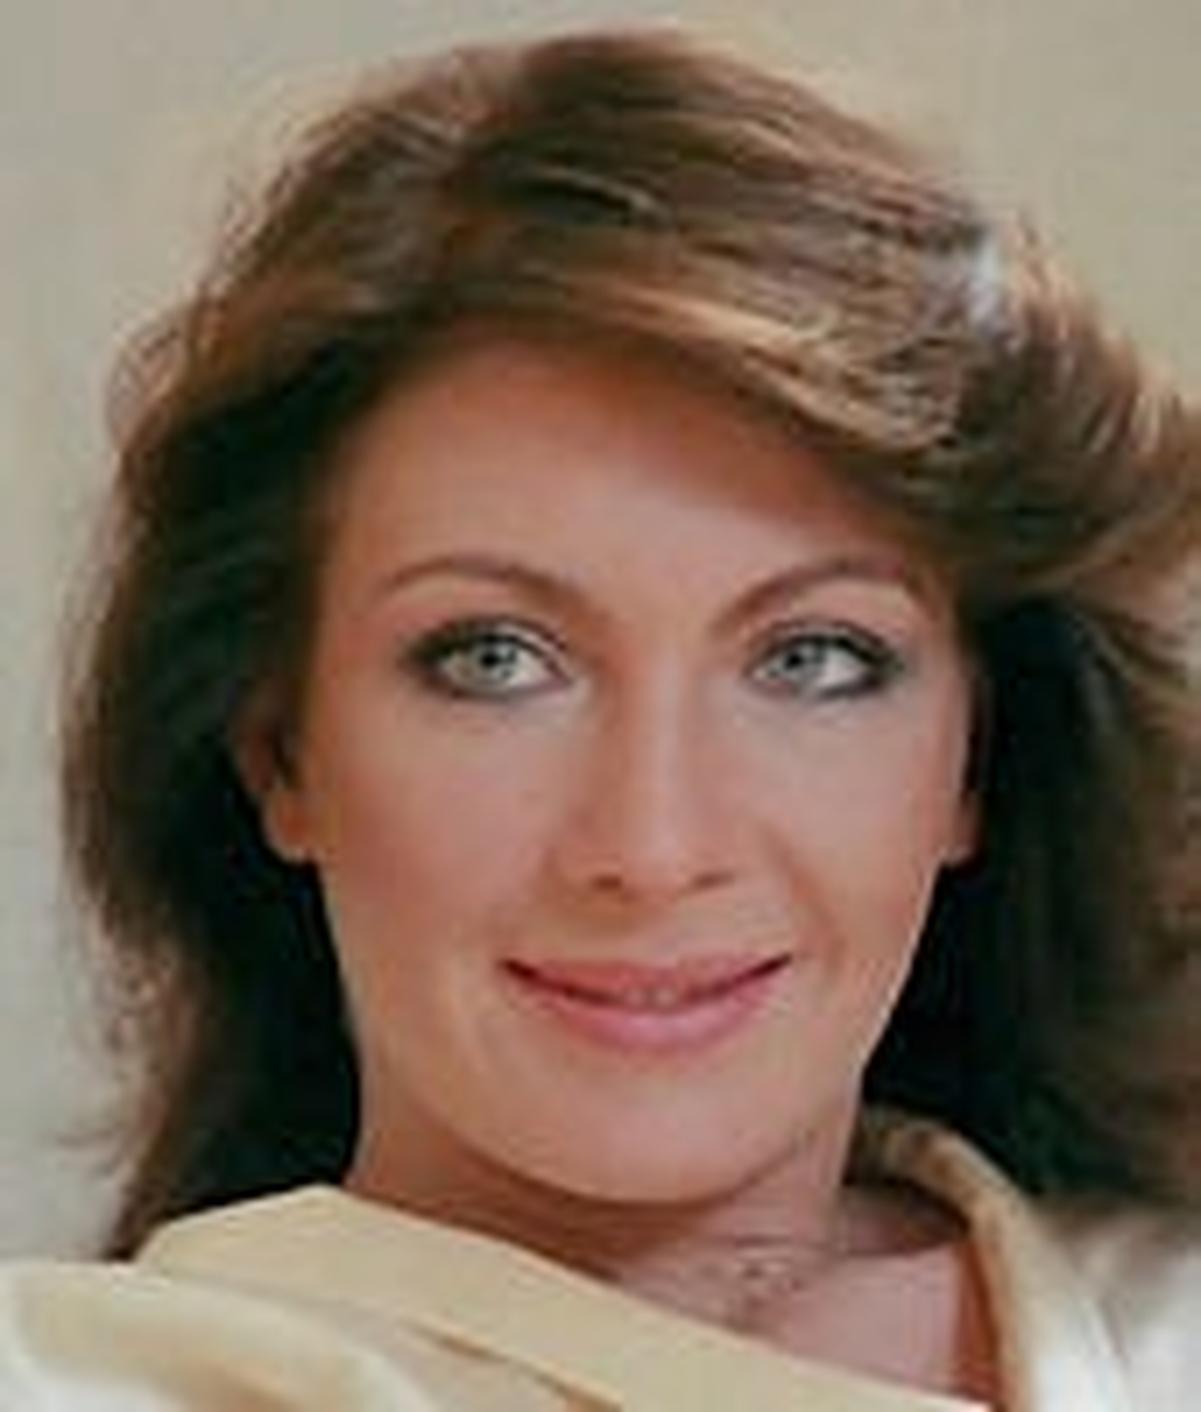 Sybil Solitaire